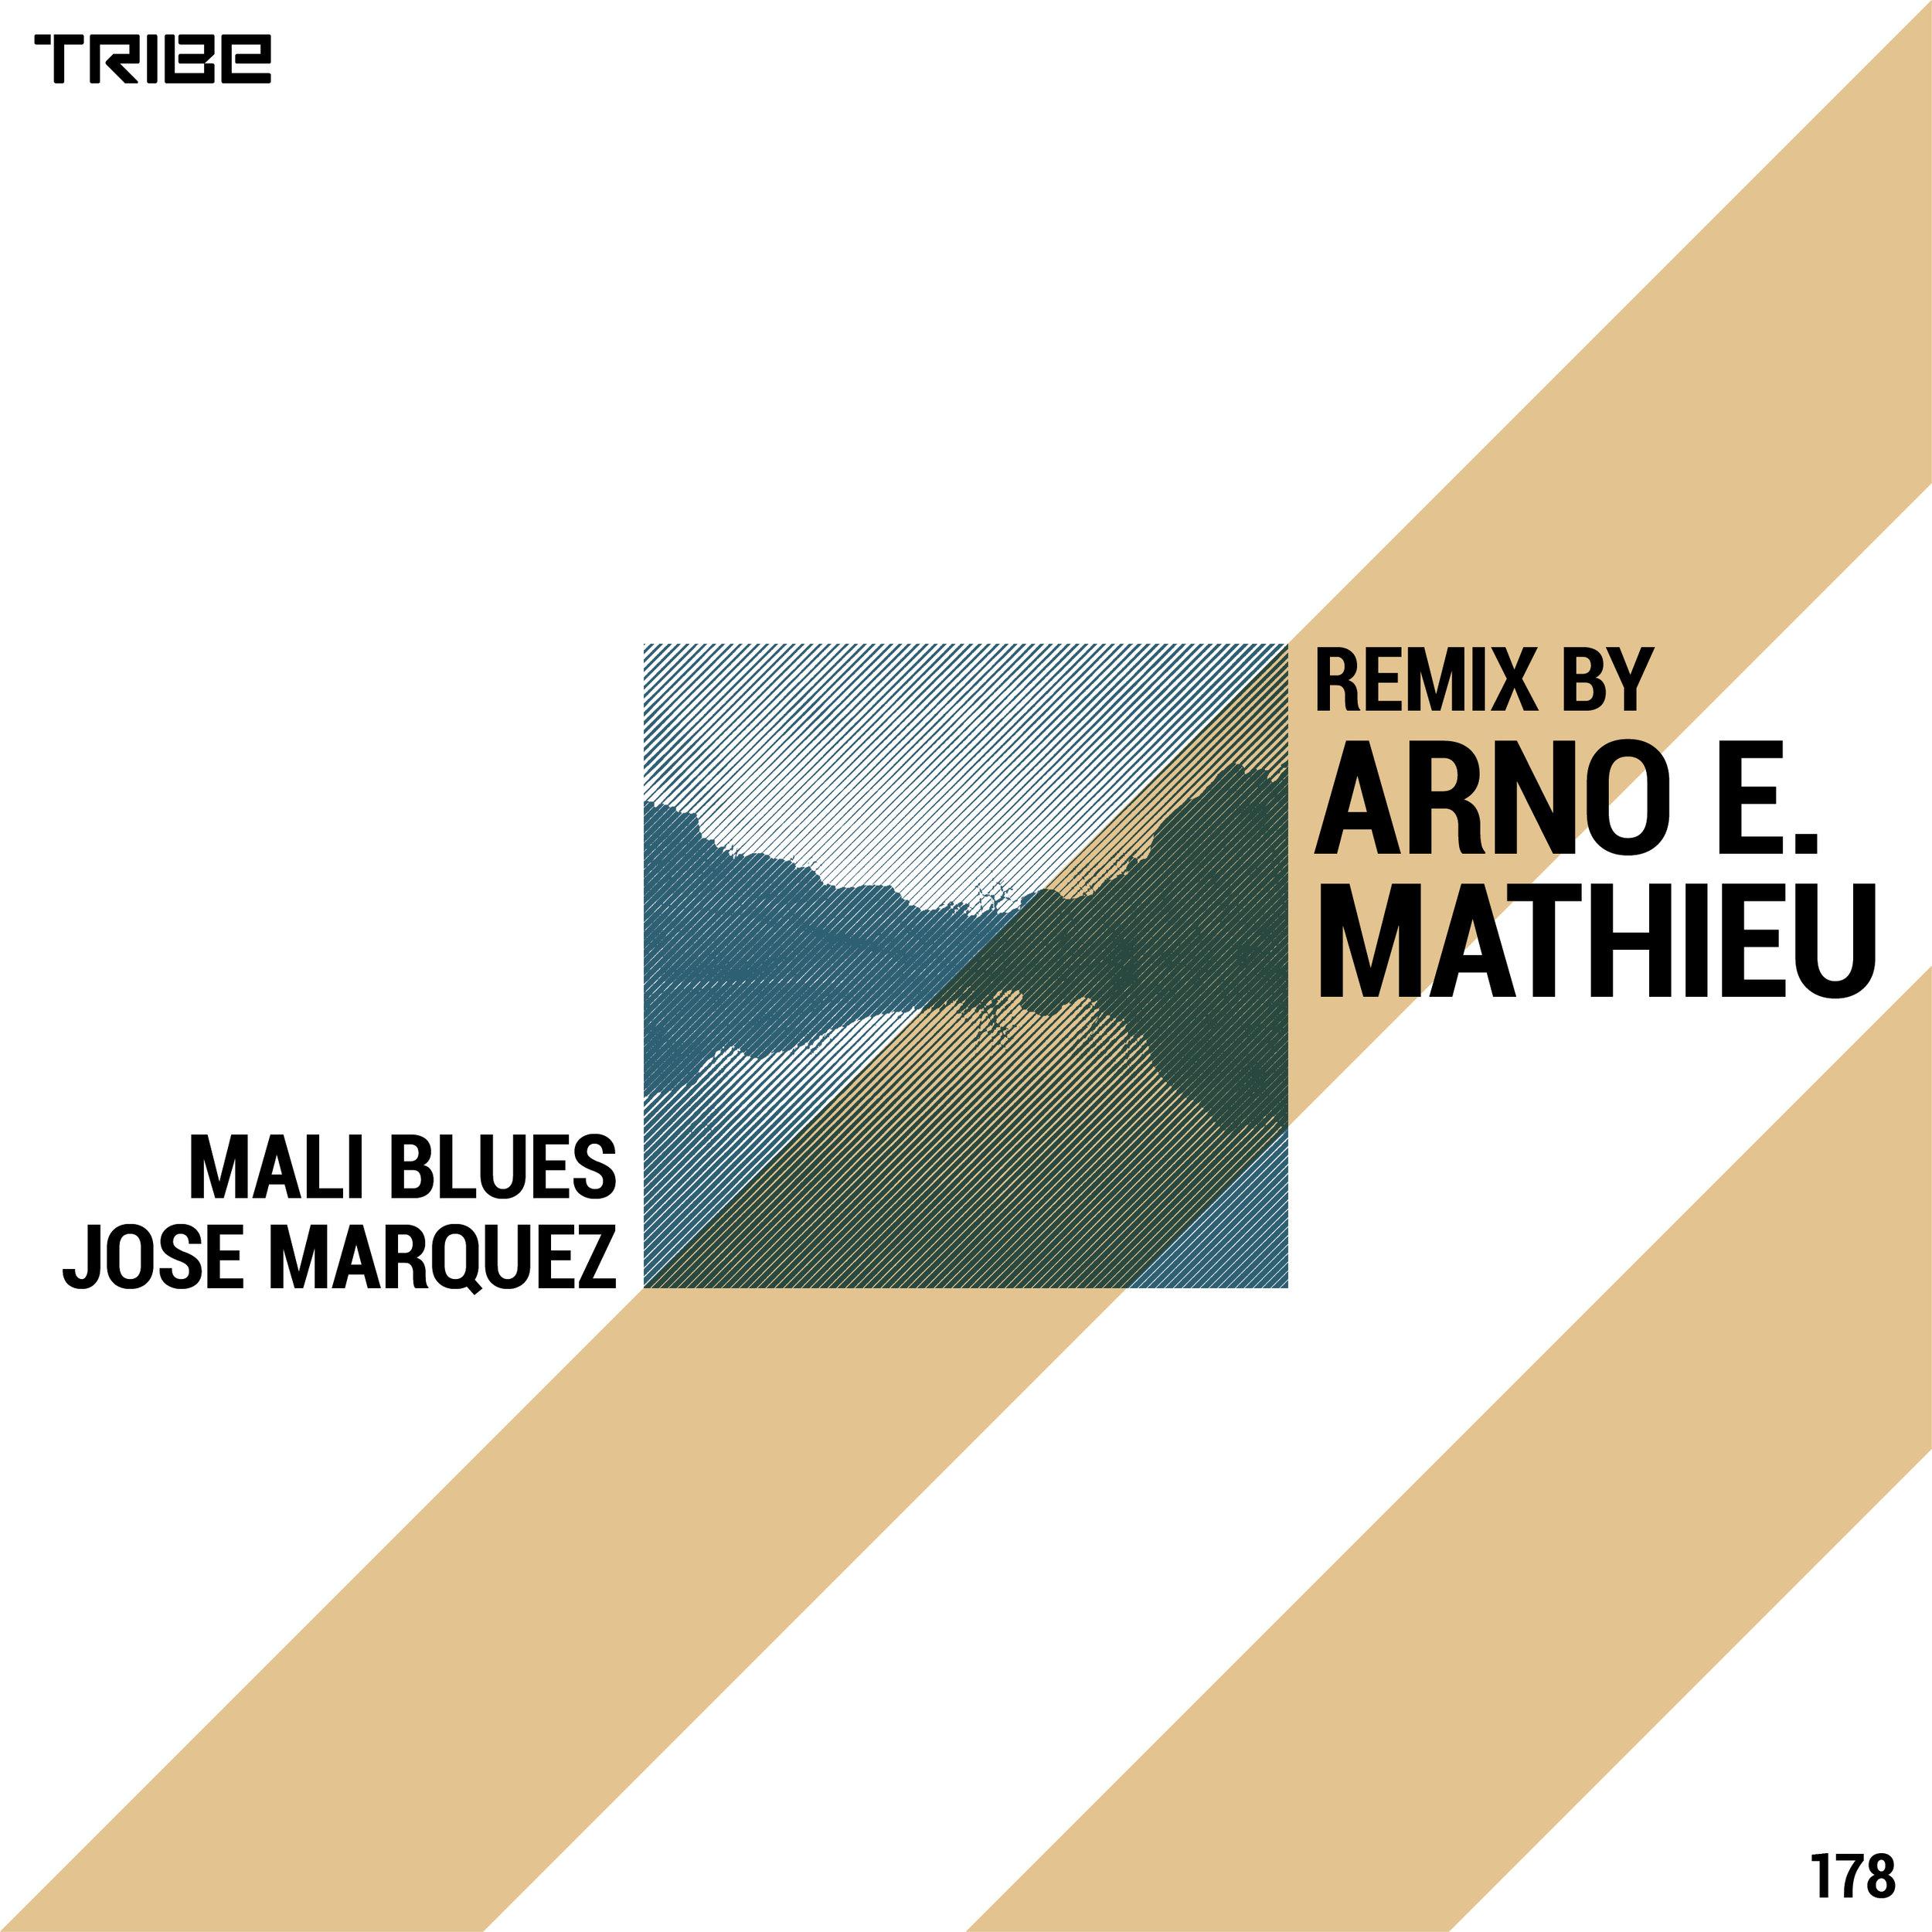 JOSE MARQUEZ   Mali Blues   (Arno E. Mathieu Remixes)